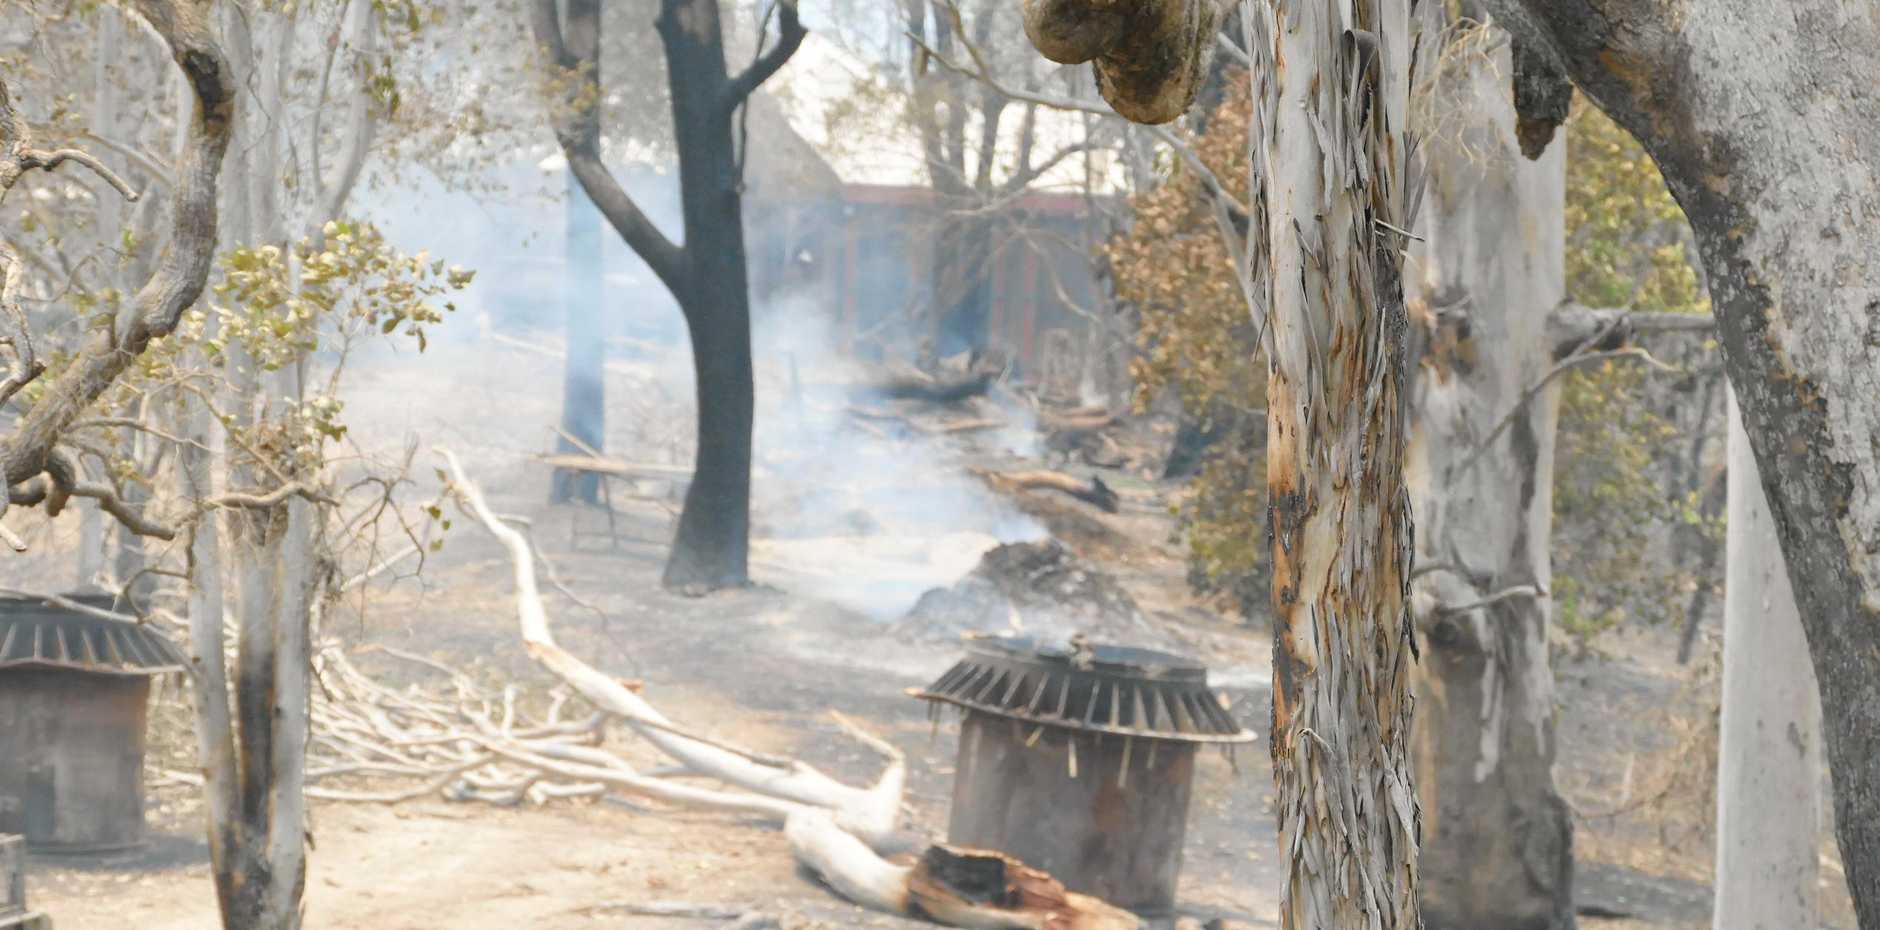 WARZONE: the scene on Rod Zietsch's property after Friday's bushfire,